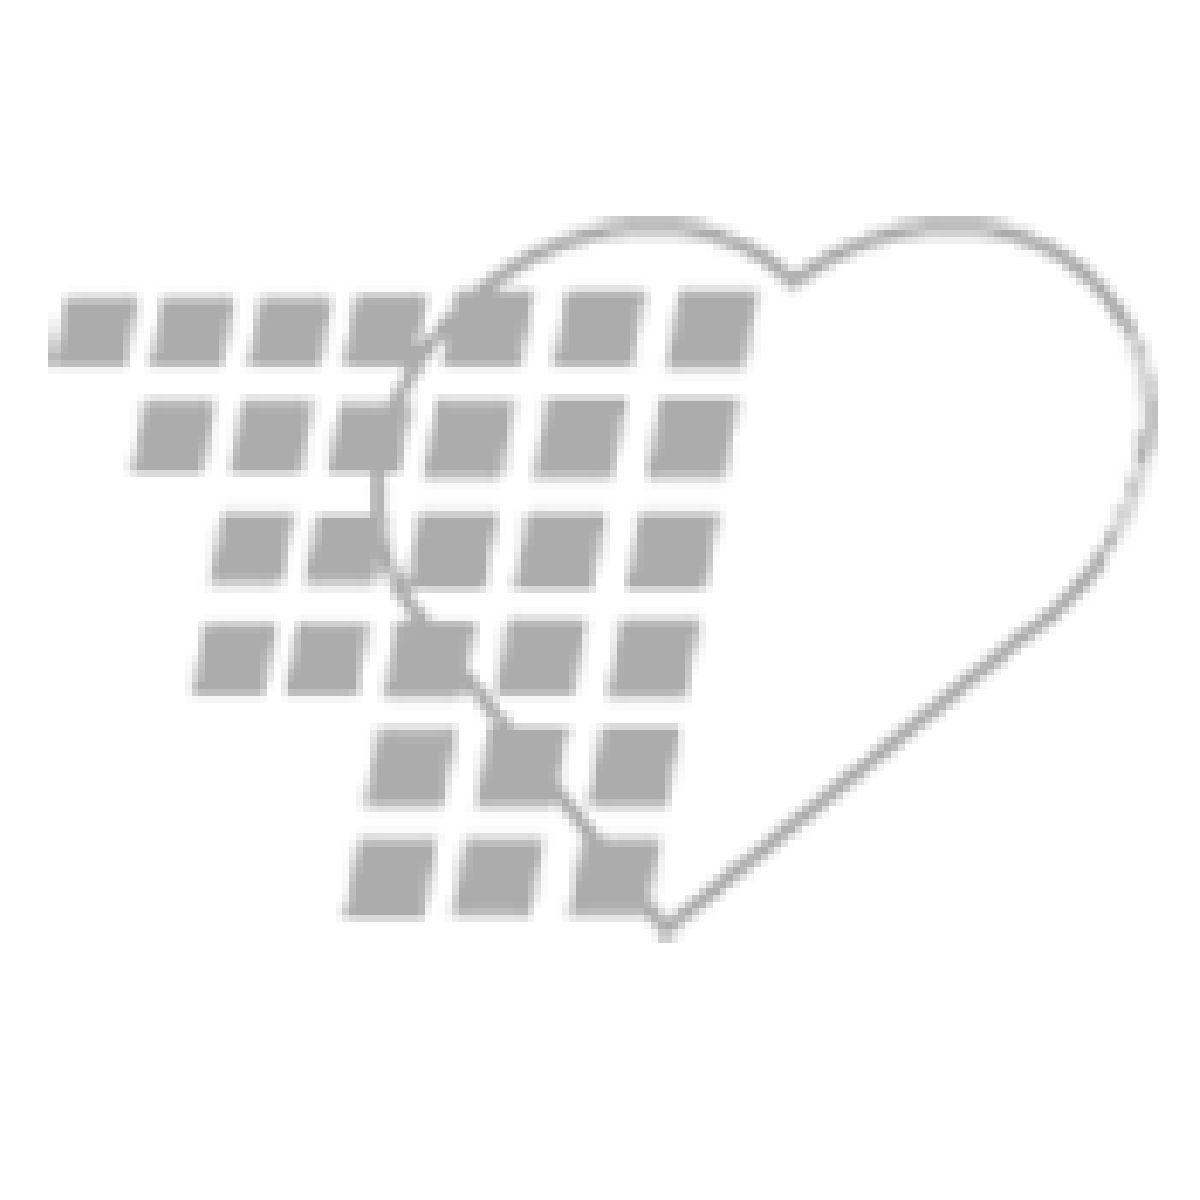 02-70-4080-ADLT - Laryngoscope   Miller Blade #3